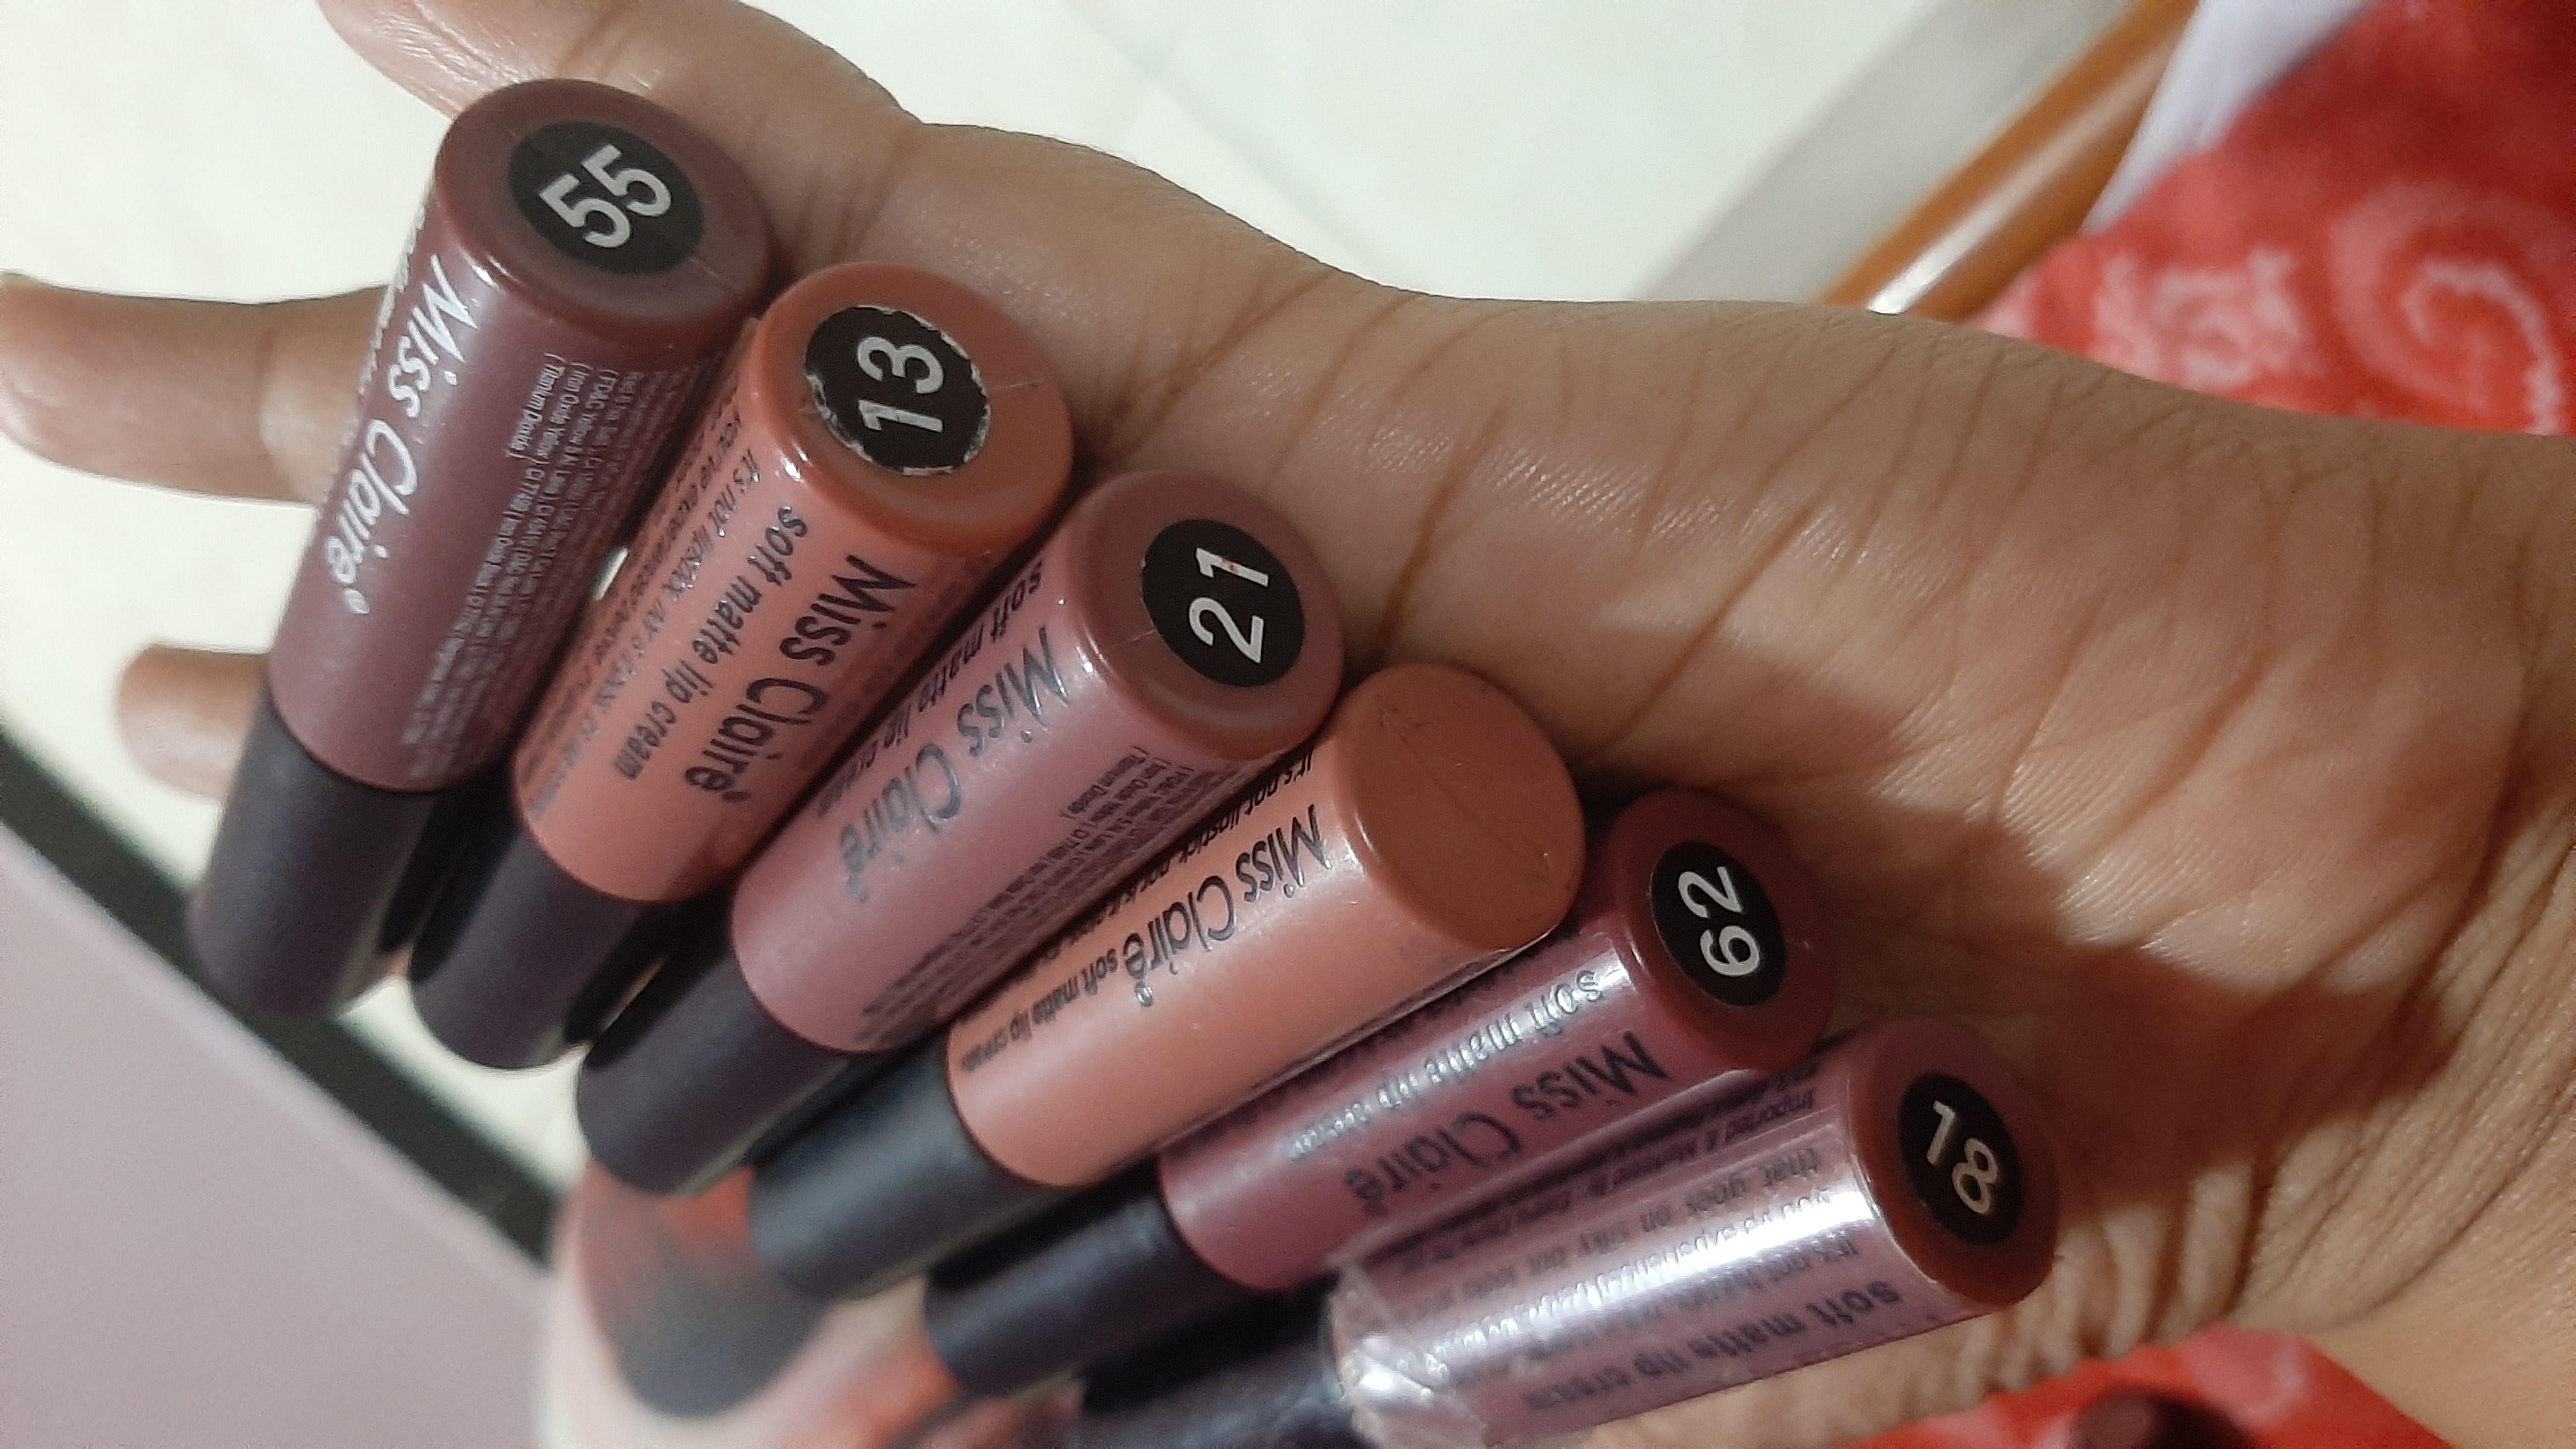 Miss Claire Soft Matte Lip Cream-Excellent product a must buy-By prachi08-2